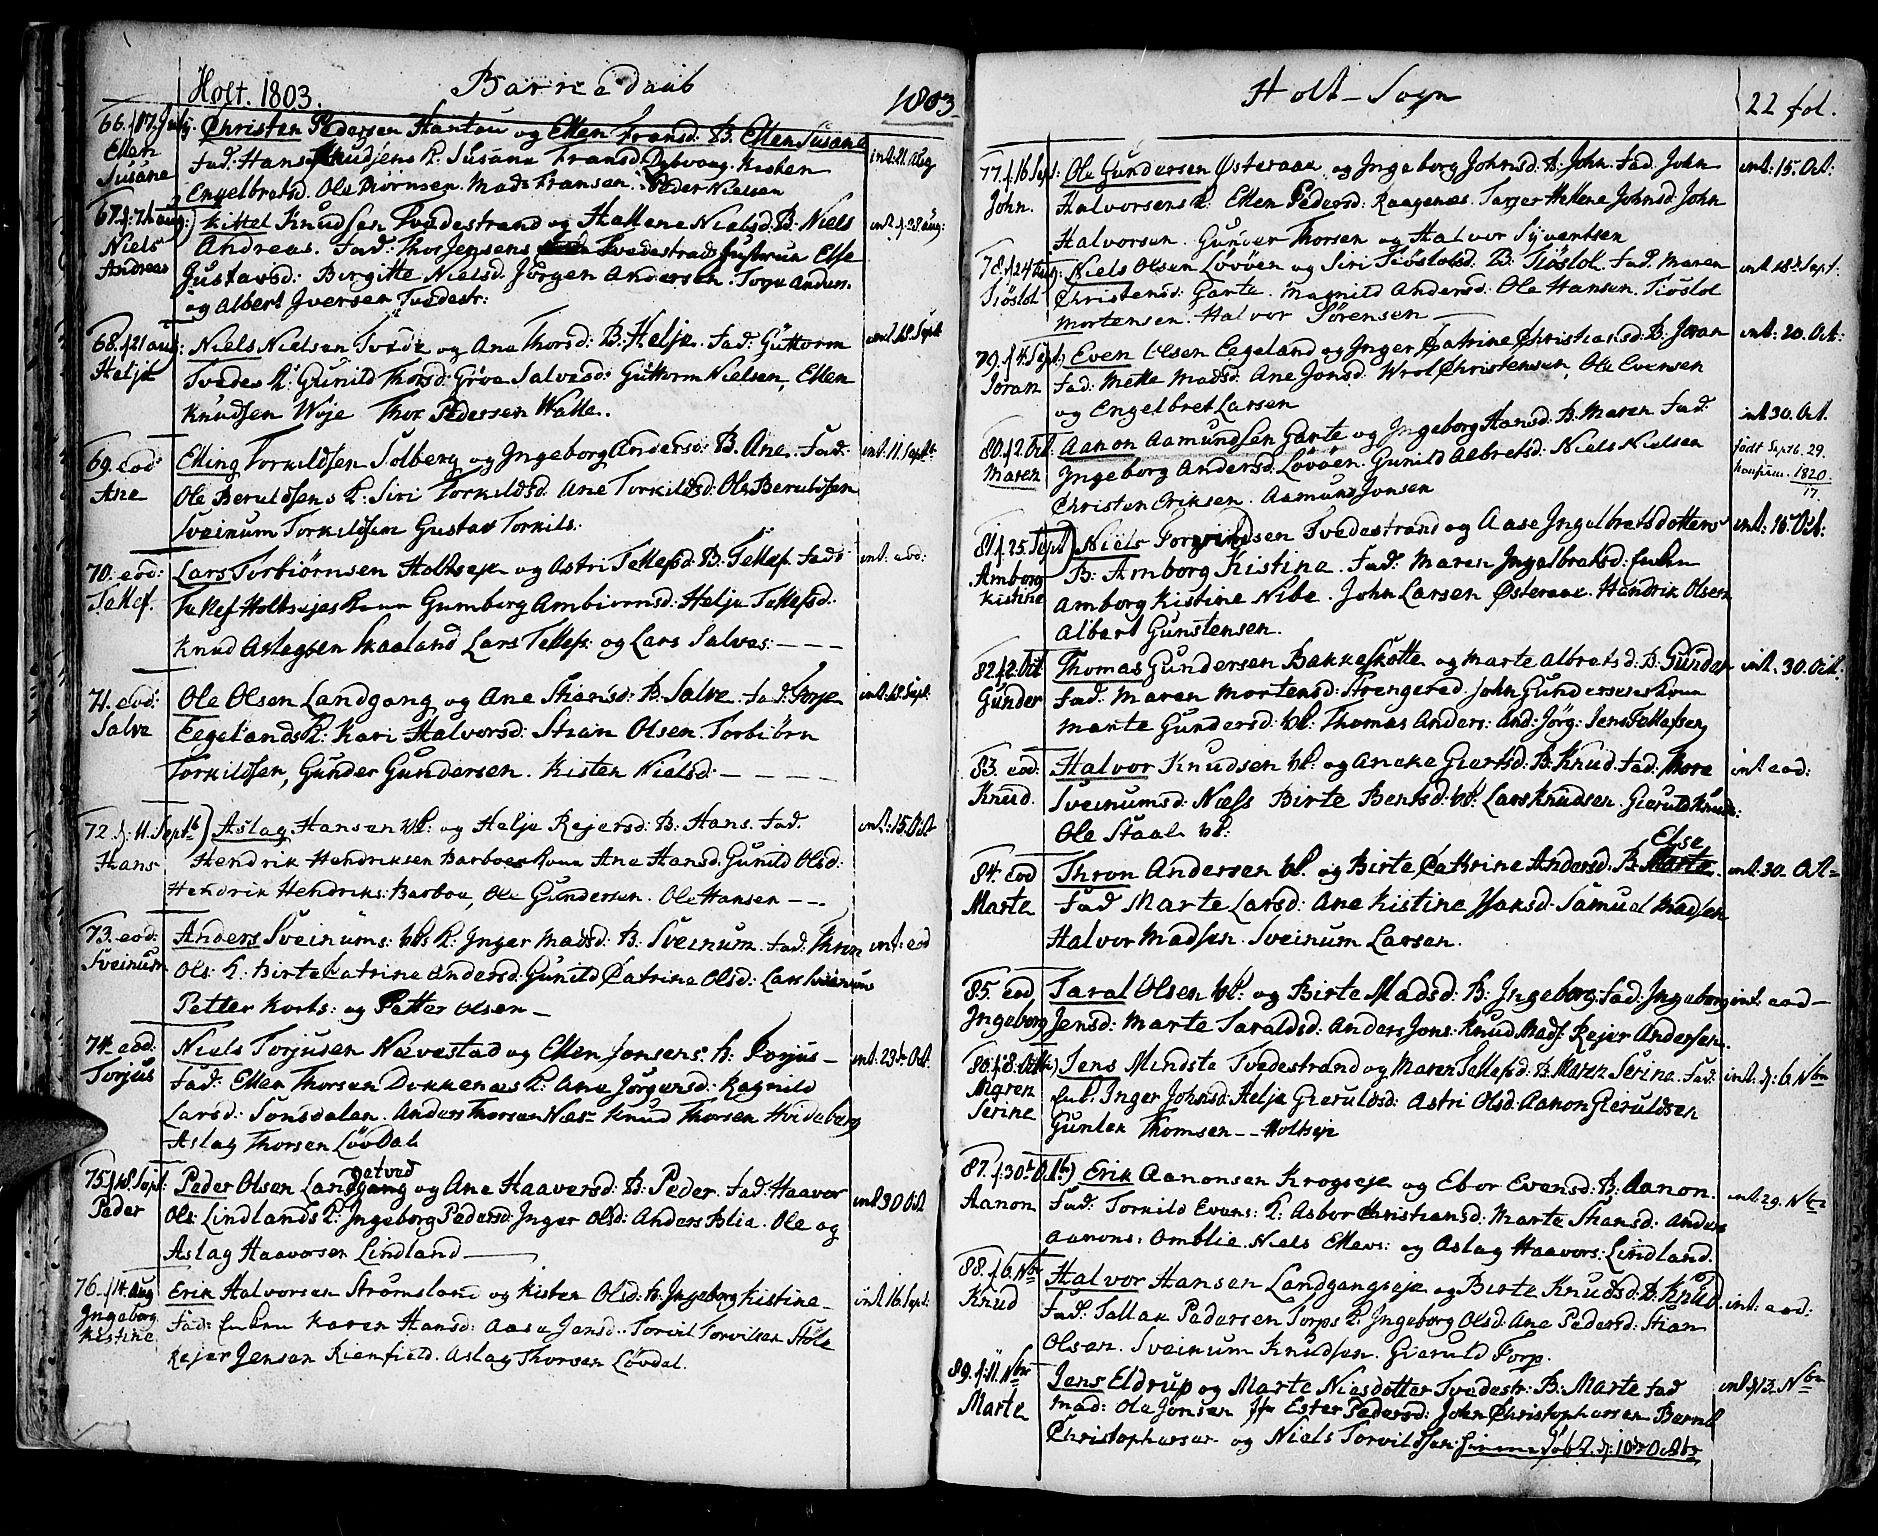 SAK, Holt sokneprestkontor, F/Fa/L0004: Ministerialbok nr. A 4, 1799-1813, s. 22